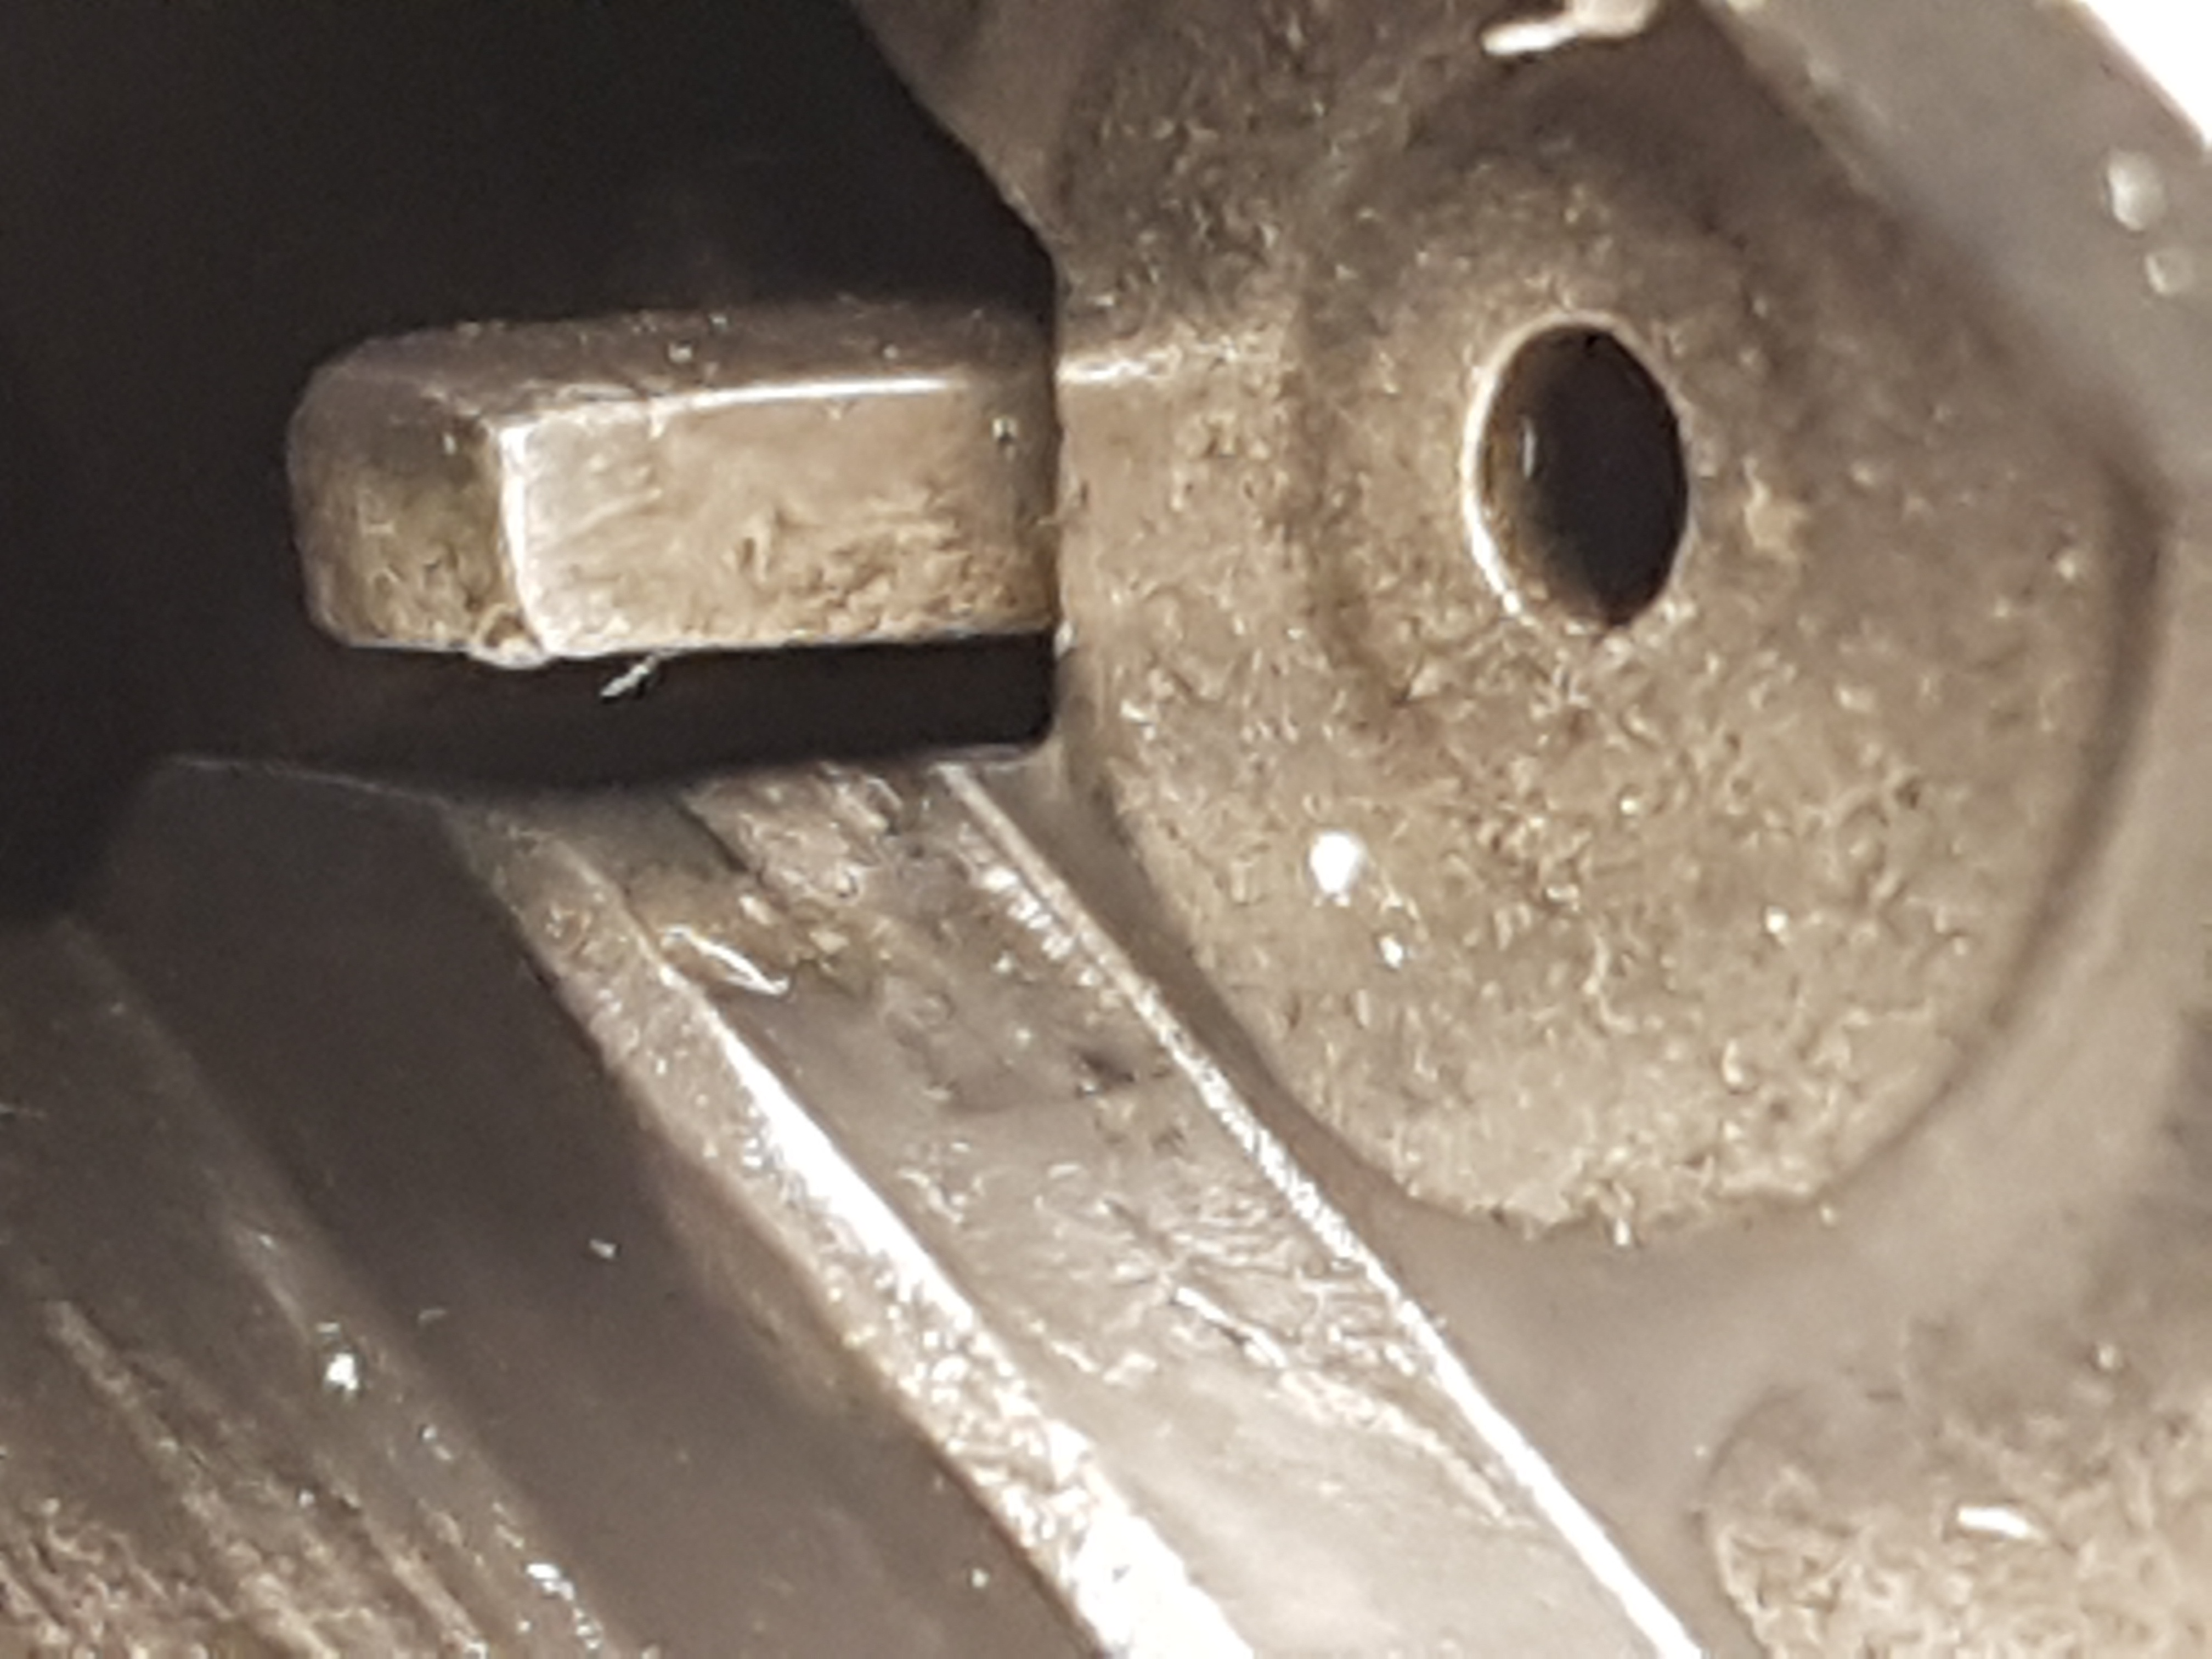 Usp 9mm flange groove in slide?-20190309_124400_1552132674239.jpg